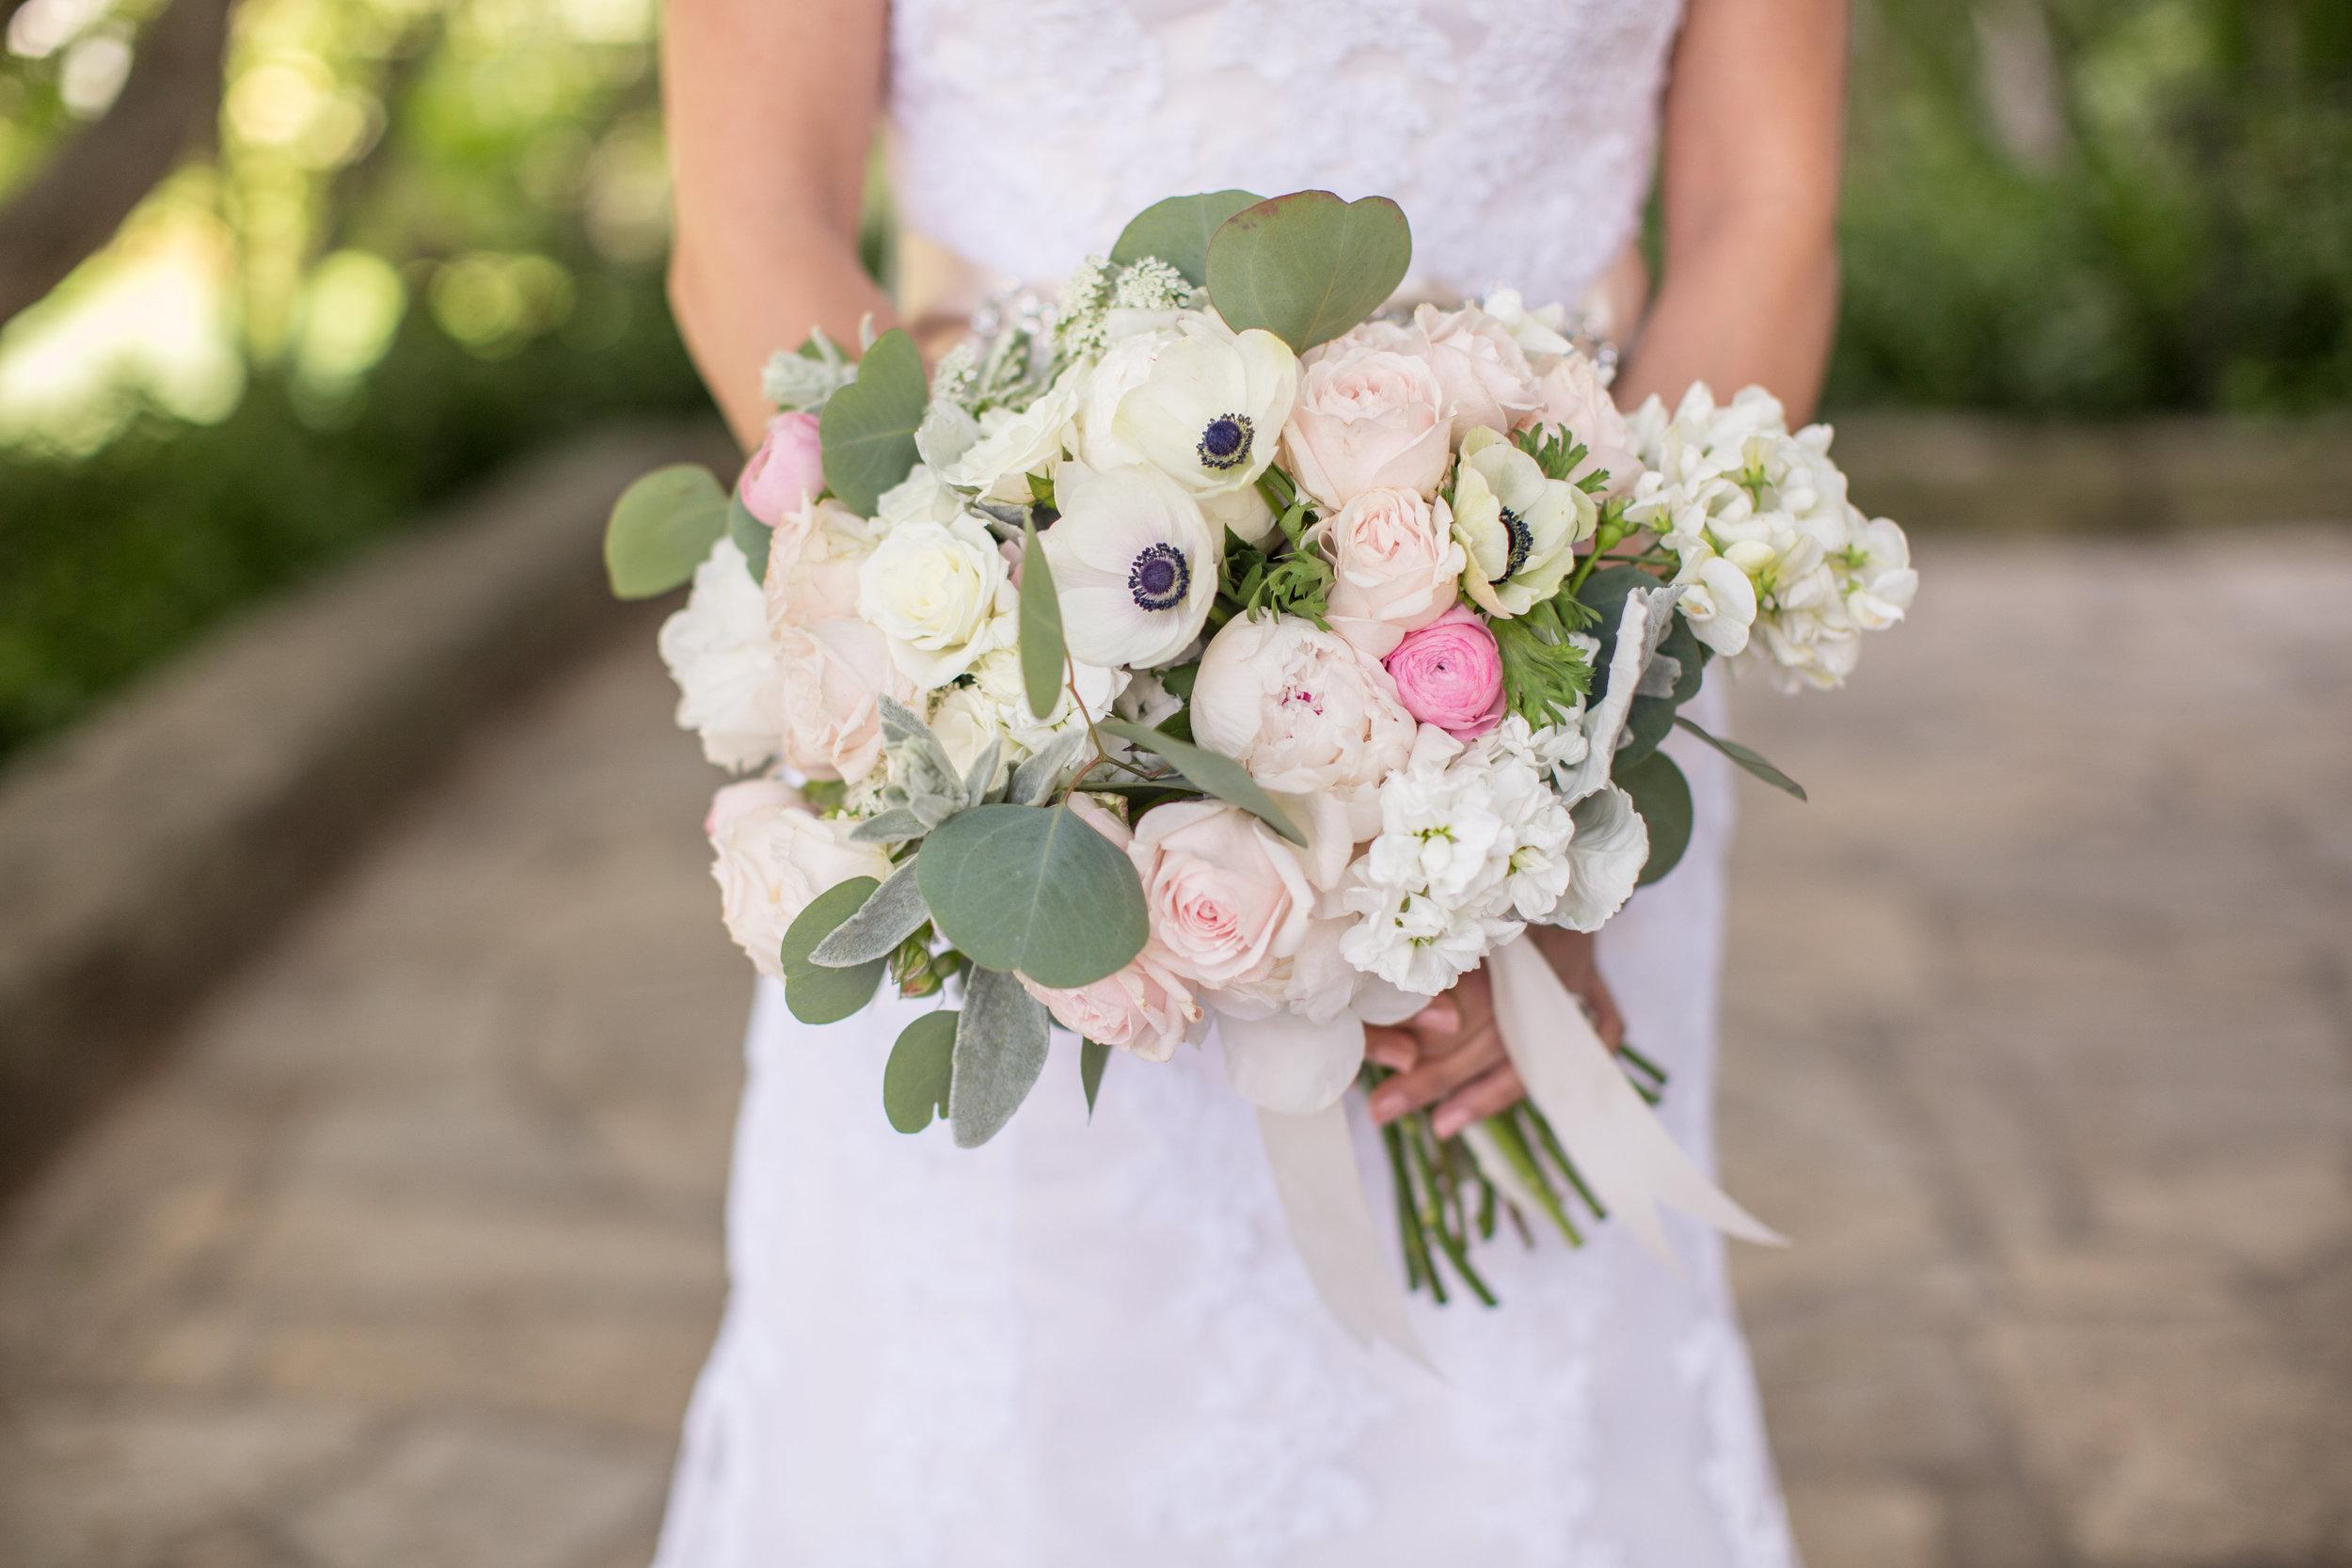 santa-barbara-elopement-wedding-planning-planner-coordinator-day-of-elope-courthouse-sunken-garden-clock-tower-mural-room (9).jpg